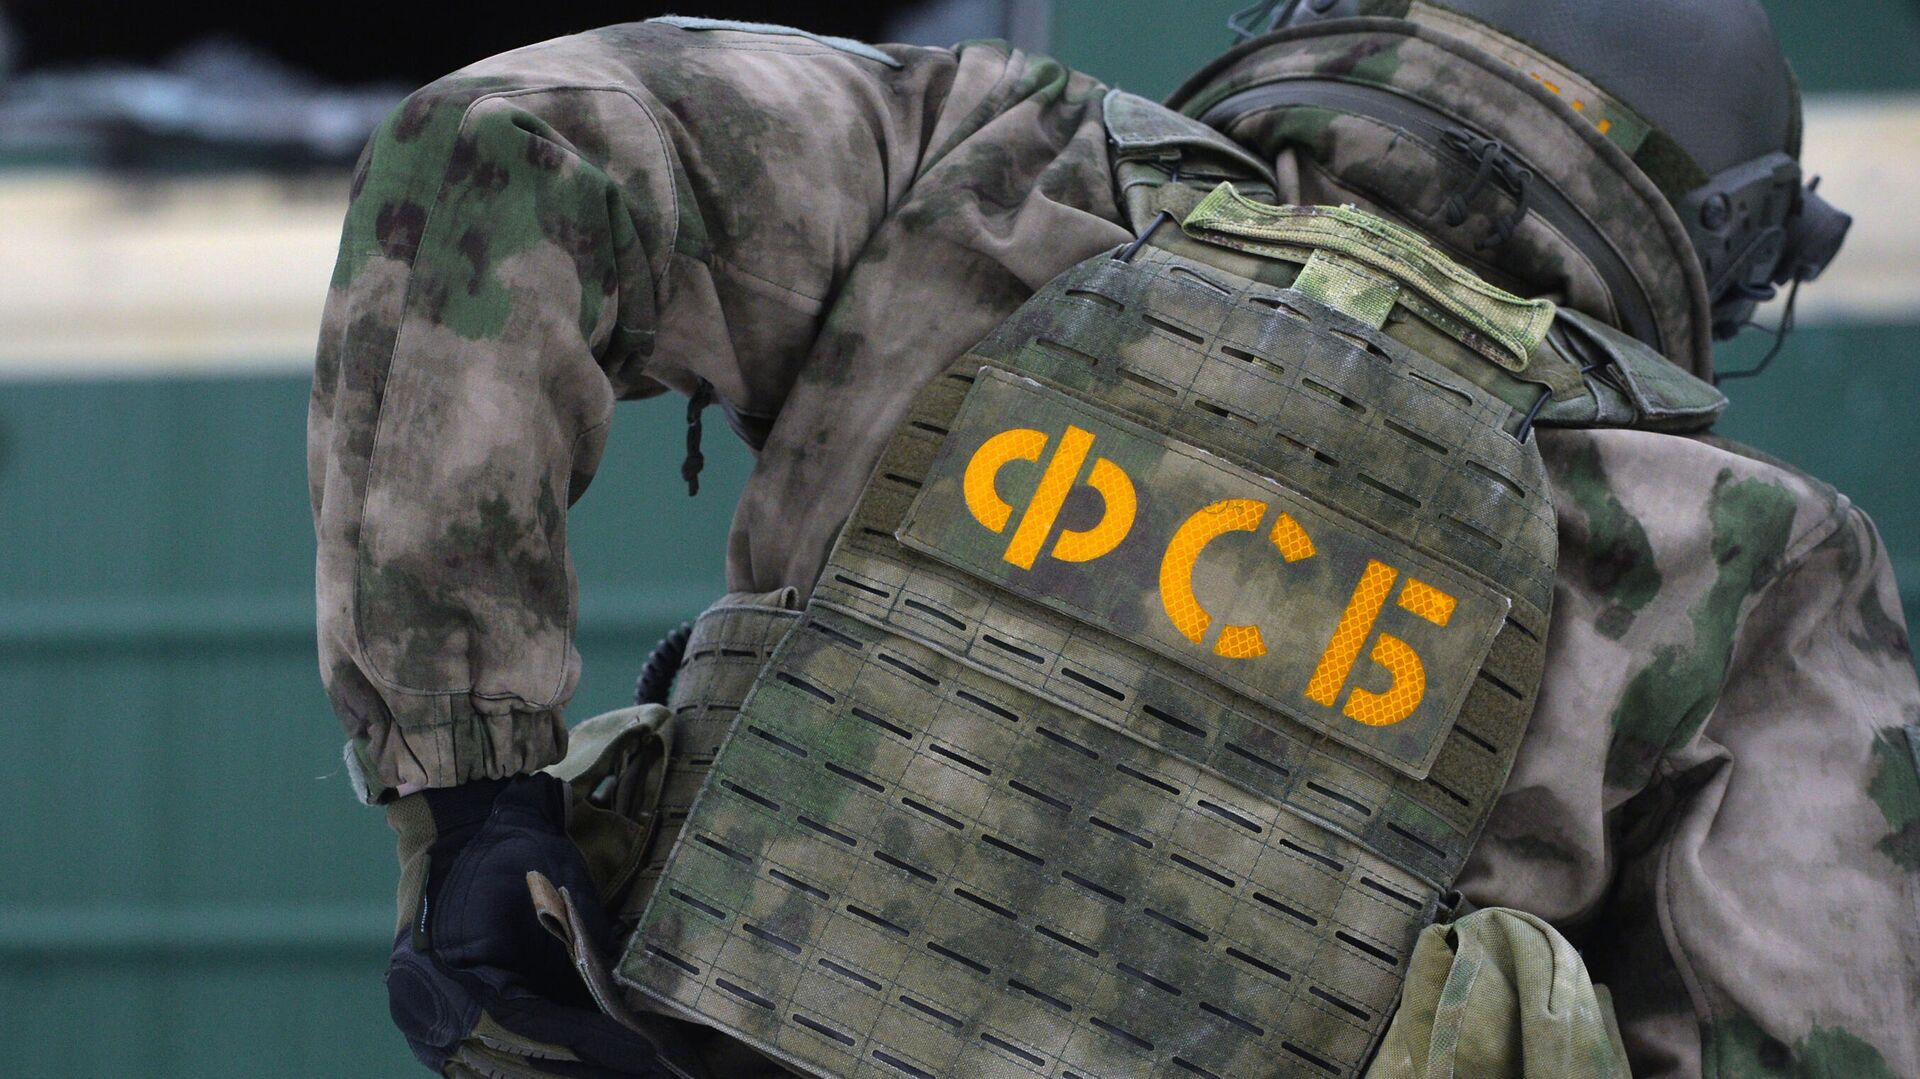 Сотрудник ФСБ - РИА Новости, 1920, 15.06.2020